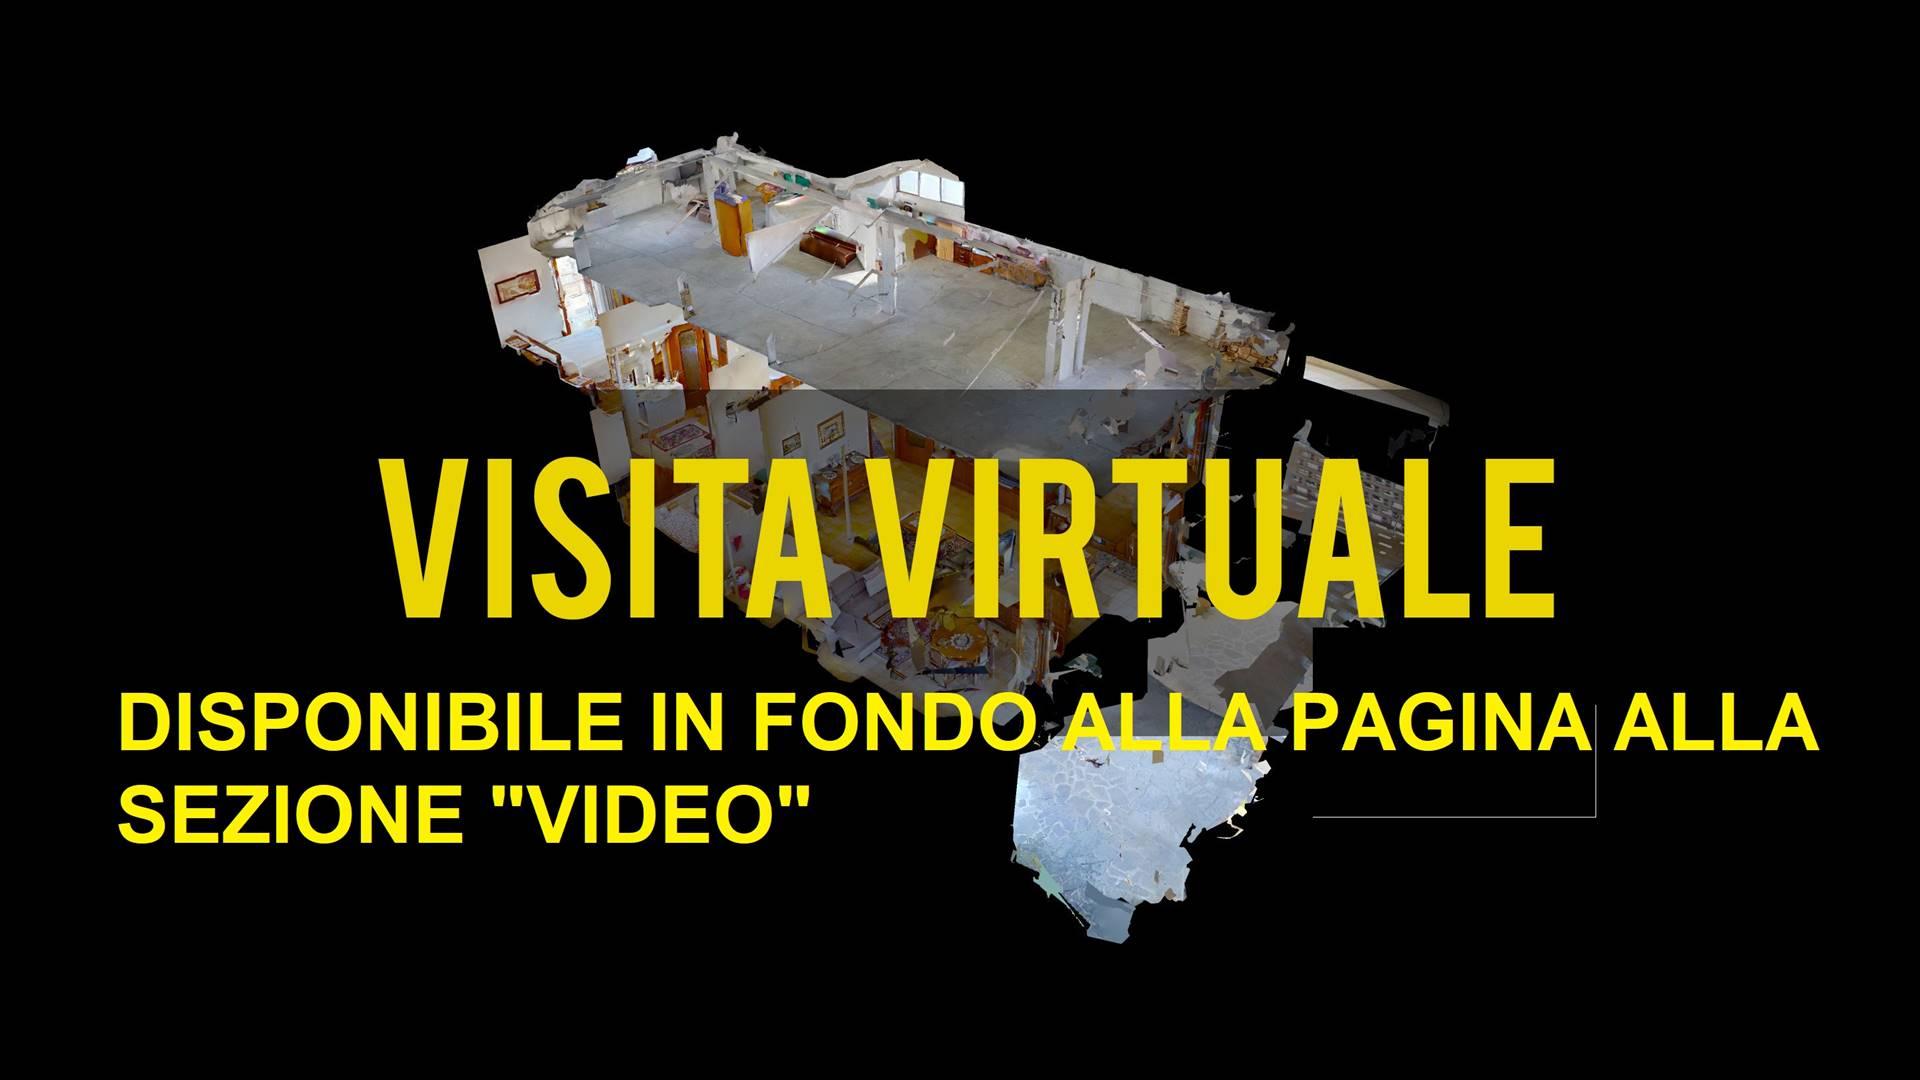 Virtual Tour Disponibile